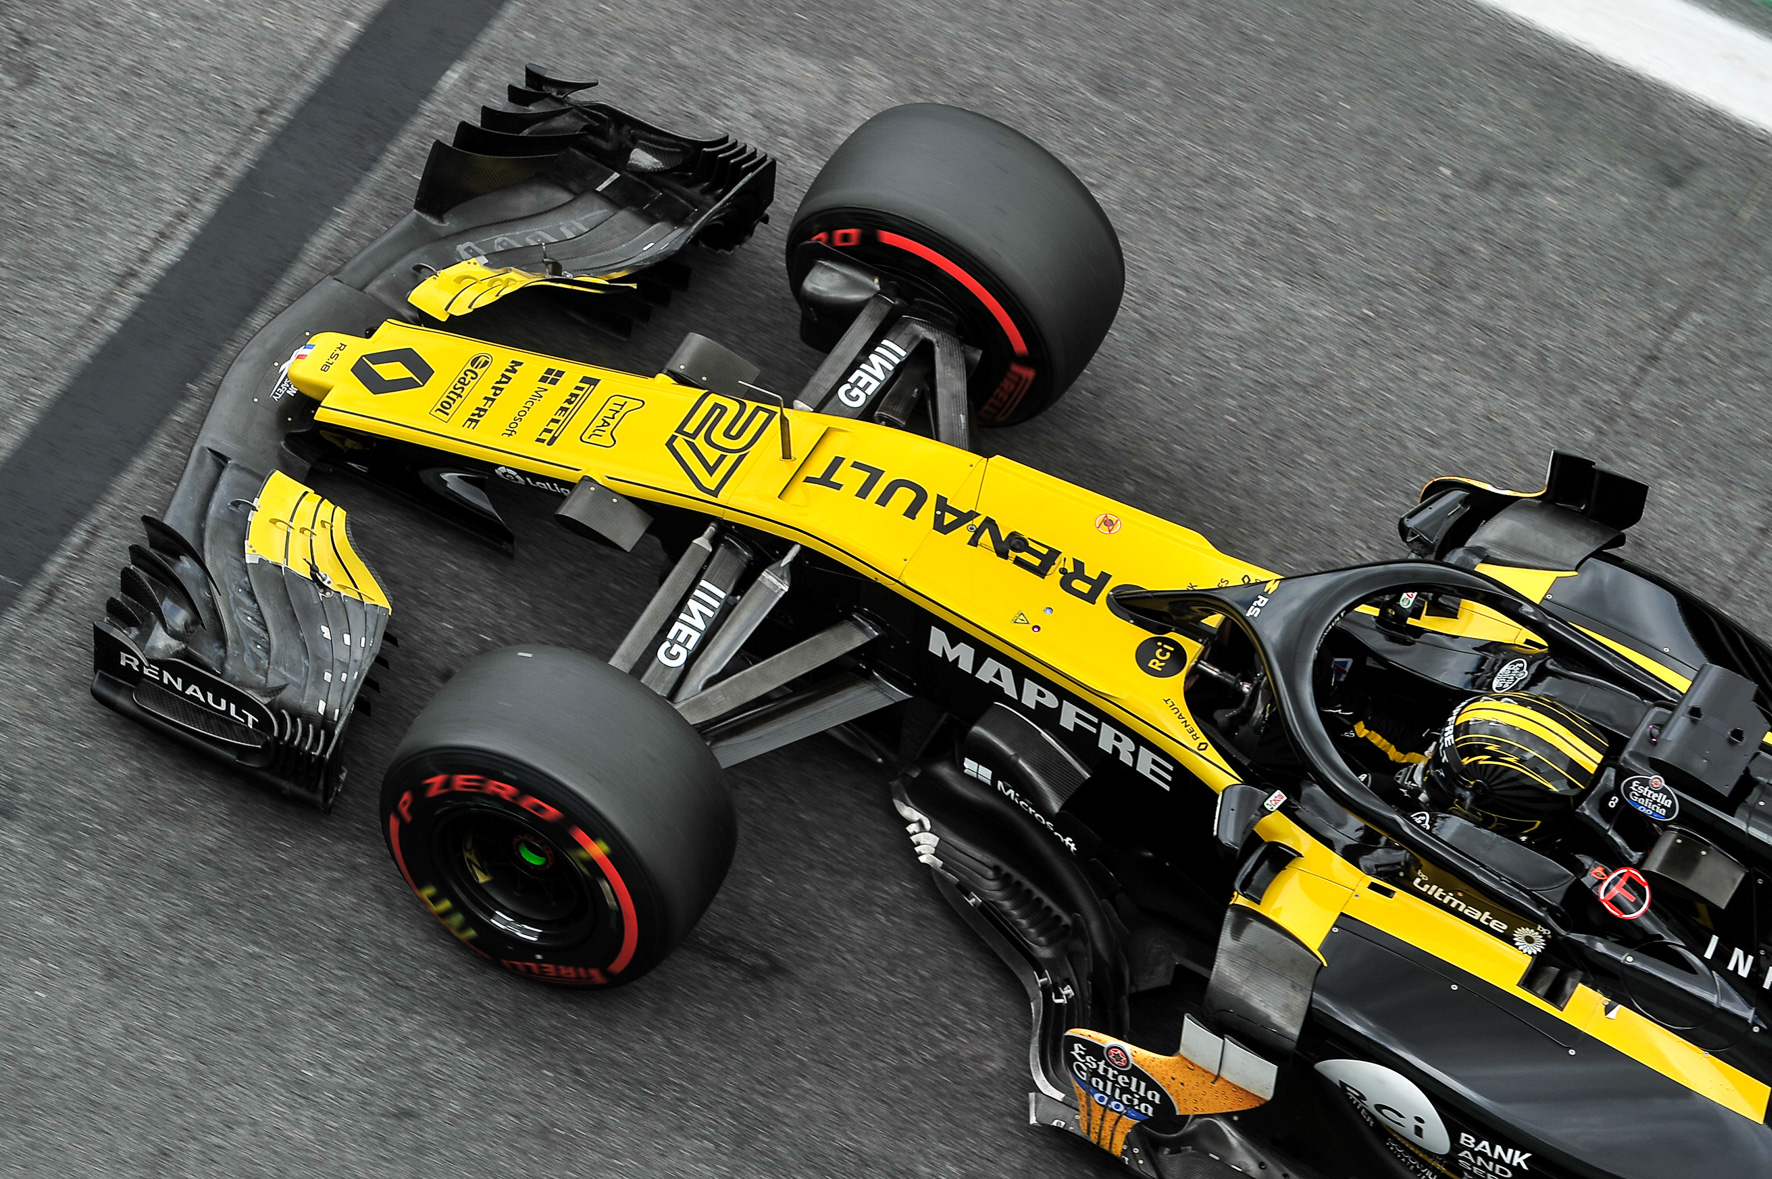 GPBrasil2018_dudabairros_Renault-31527